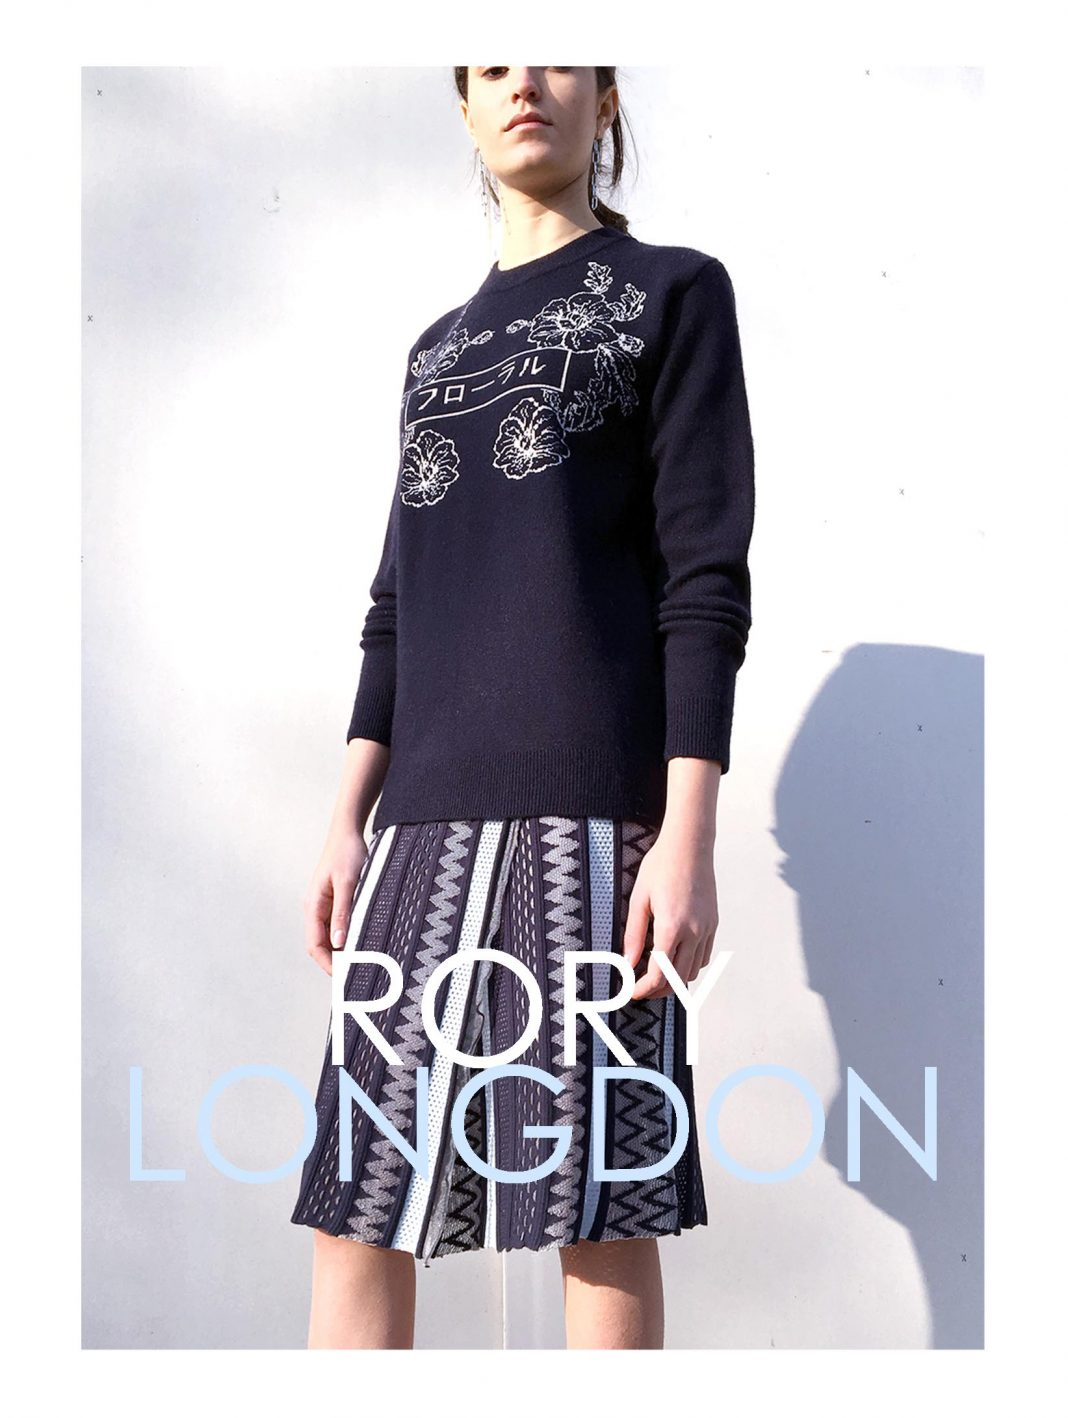 Rory Longdon knit